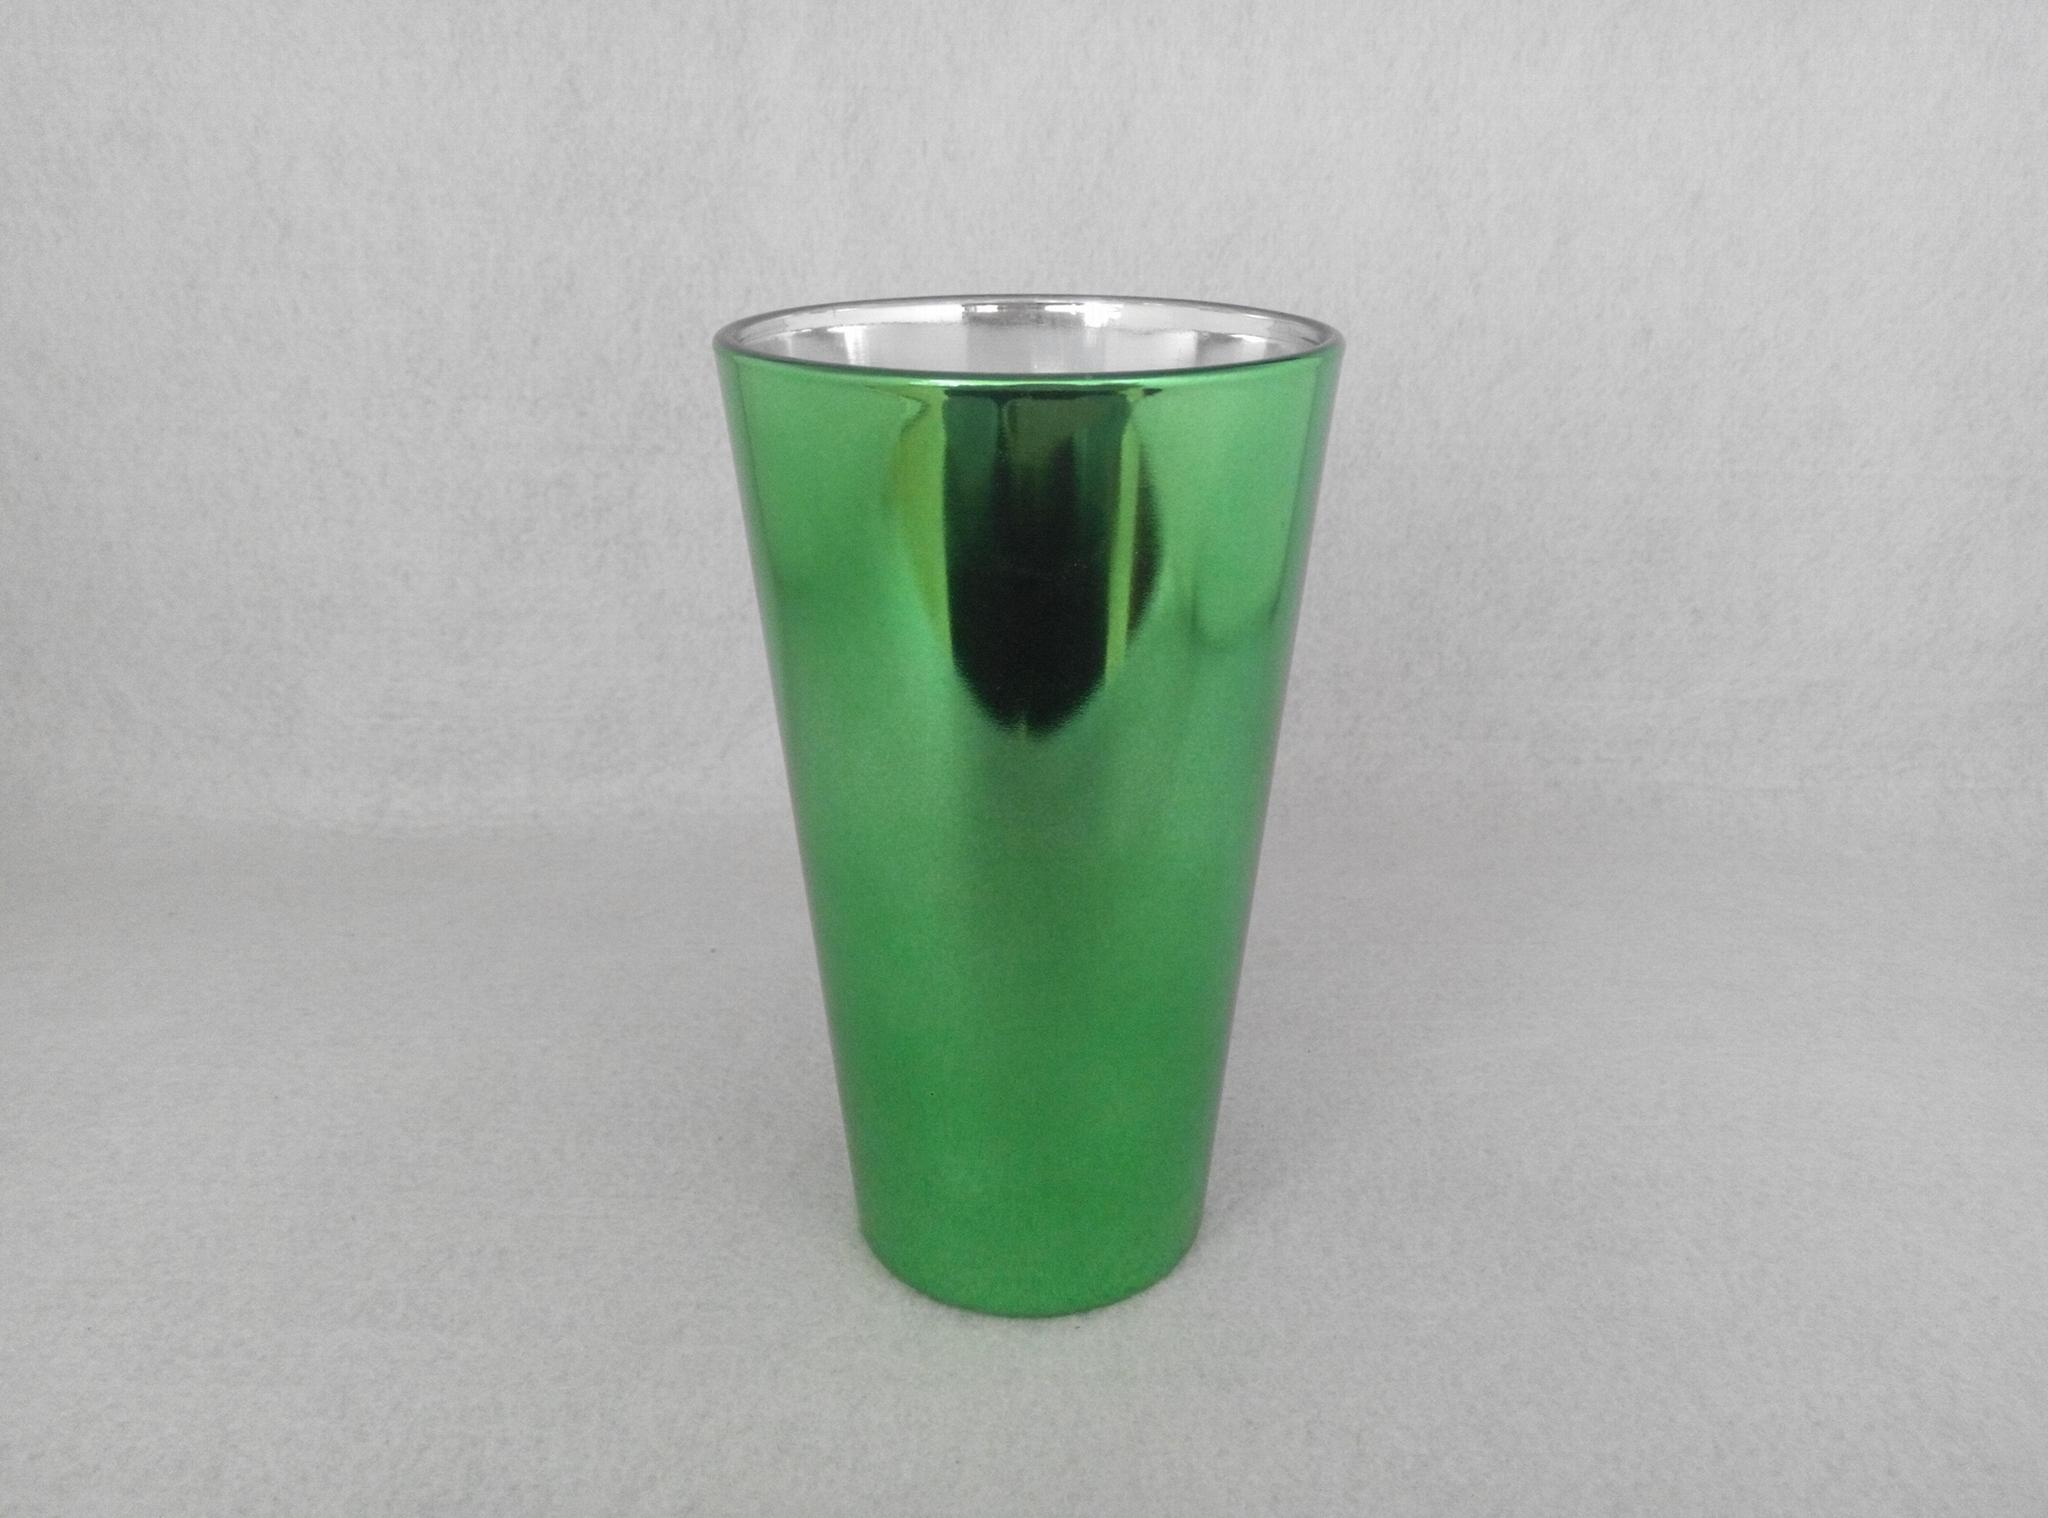 16oz METALIC SUBLIMATION PINT GLASS 6